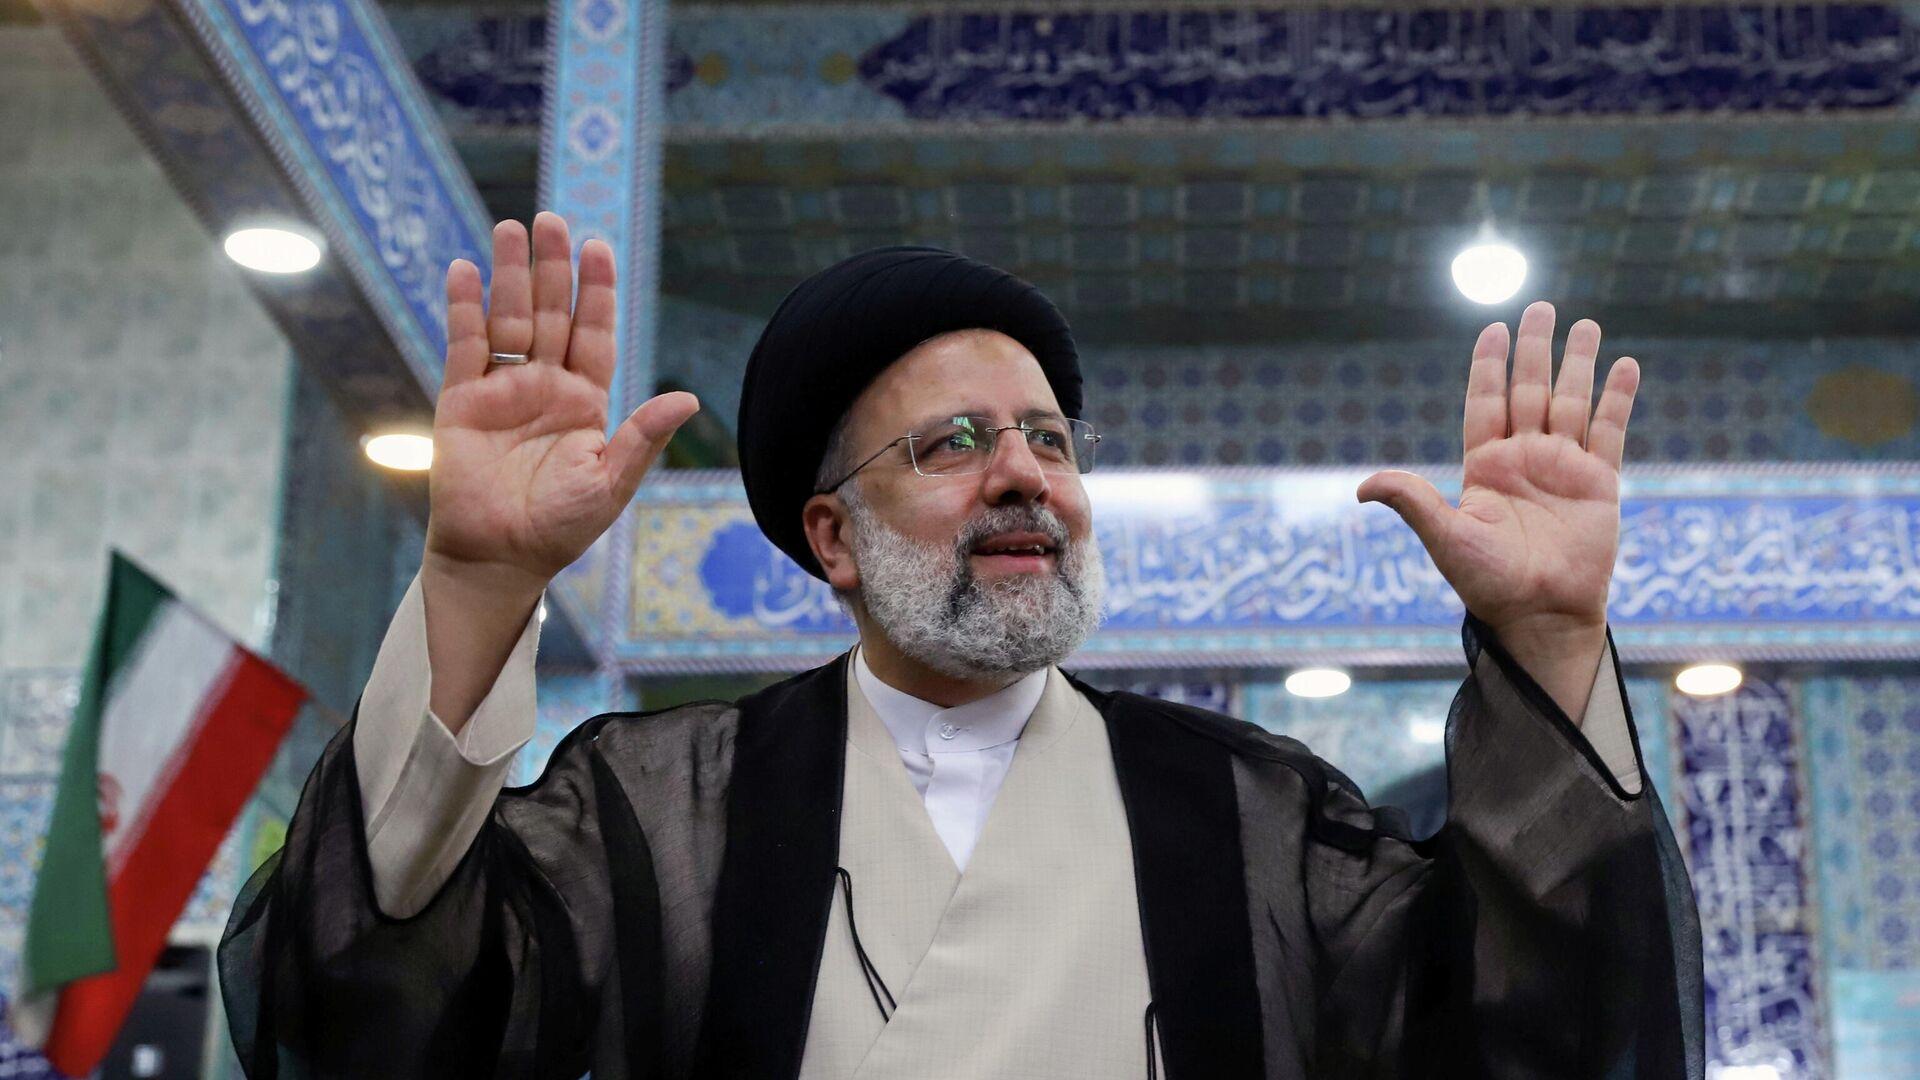 Ibrahim Raisi, candidato presidencial iraní - Sputnik Mundo, 1920, 19.06.2021